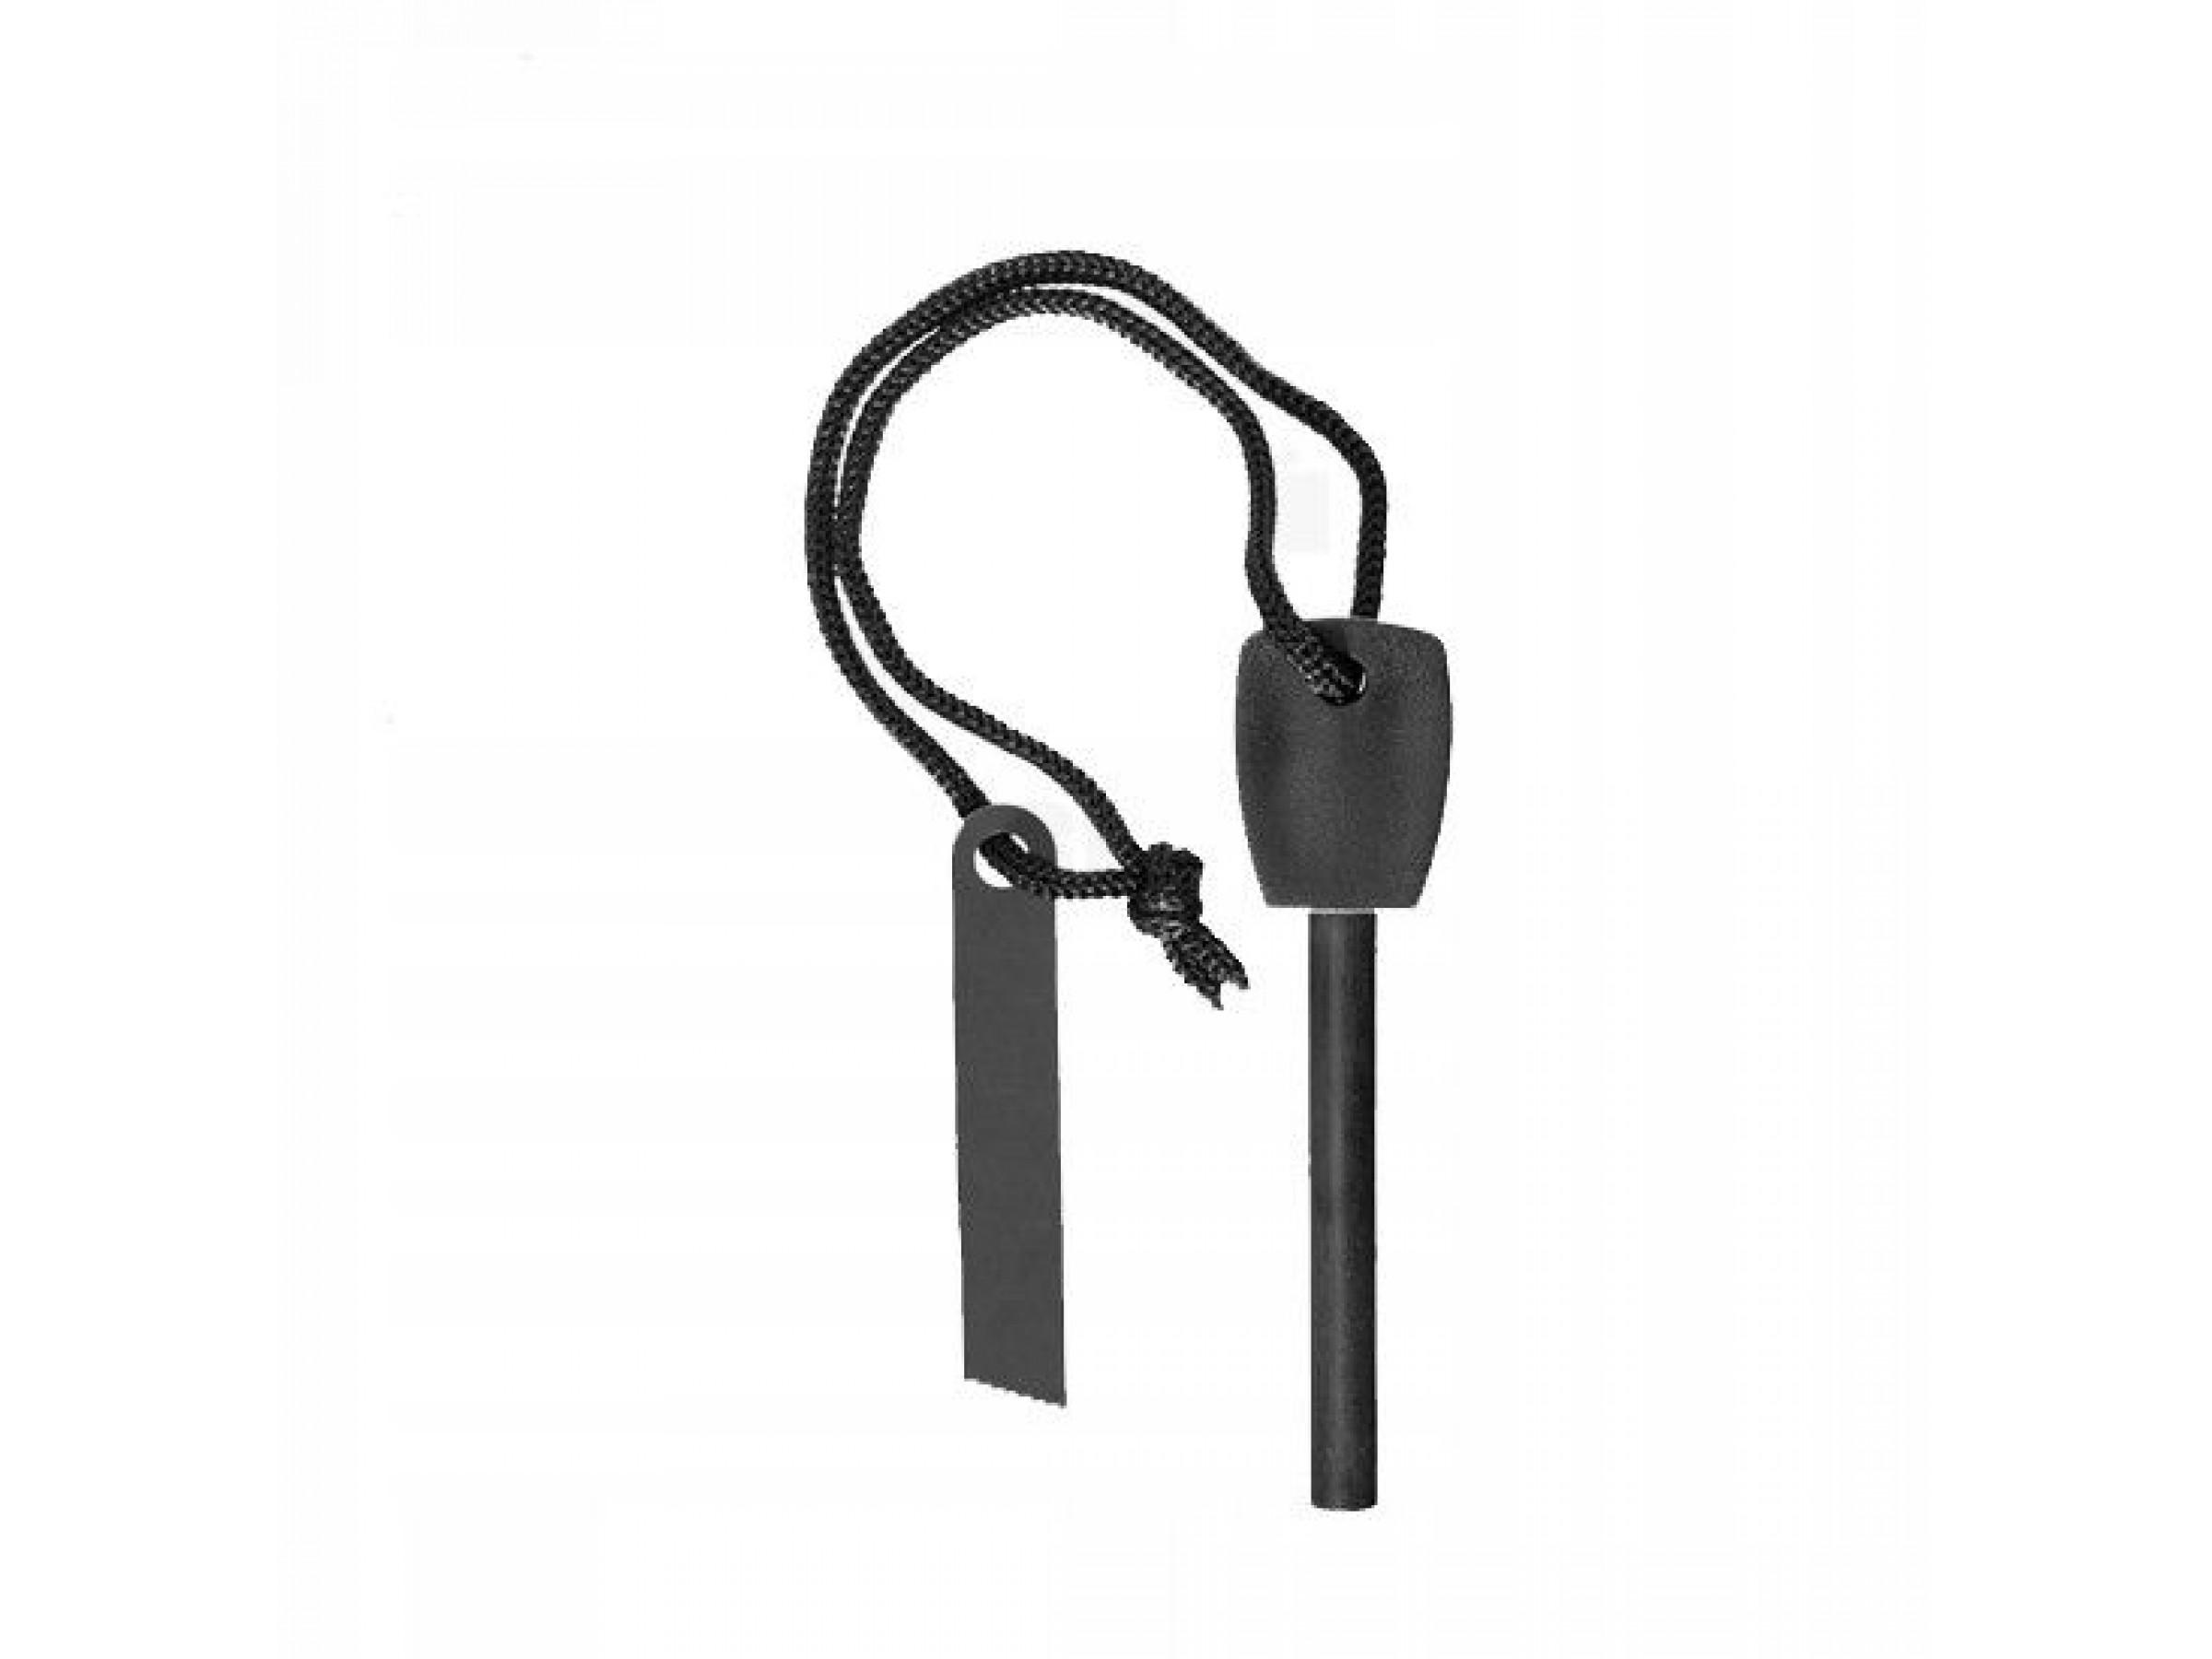 JKR - Amnar cu baton de magneziu - Negru